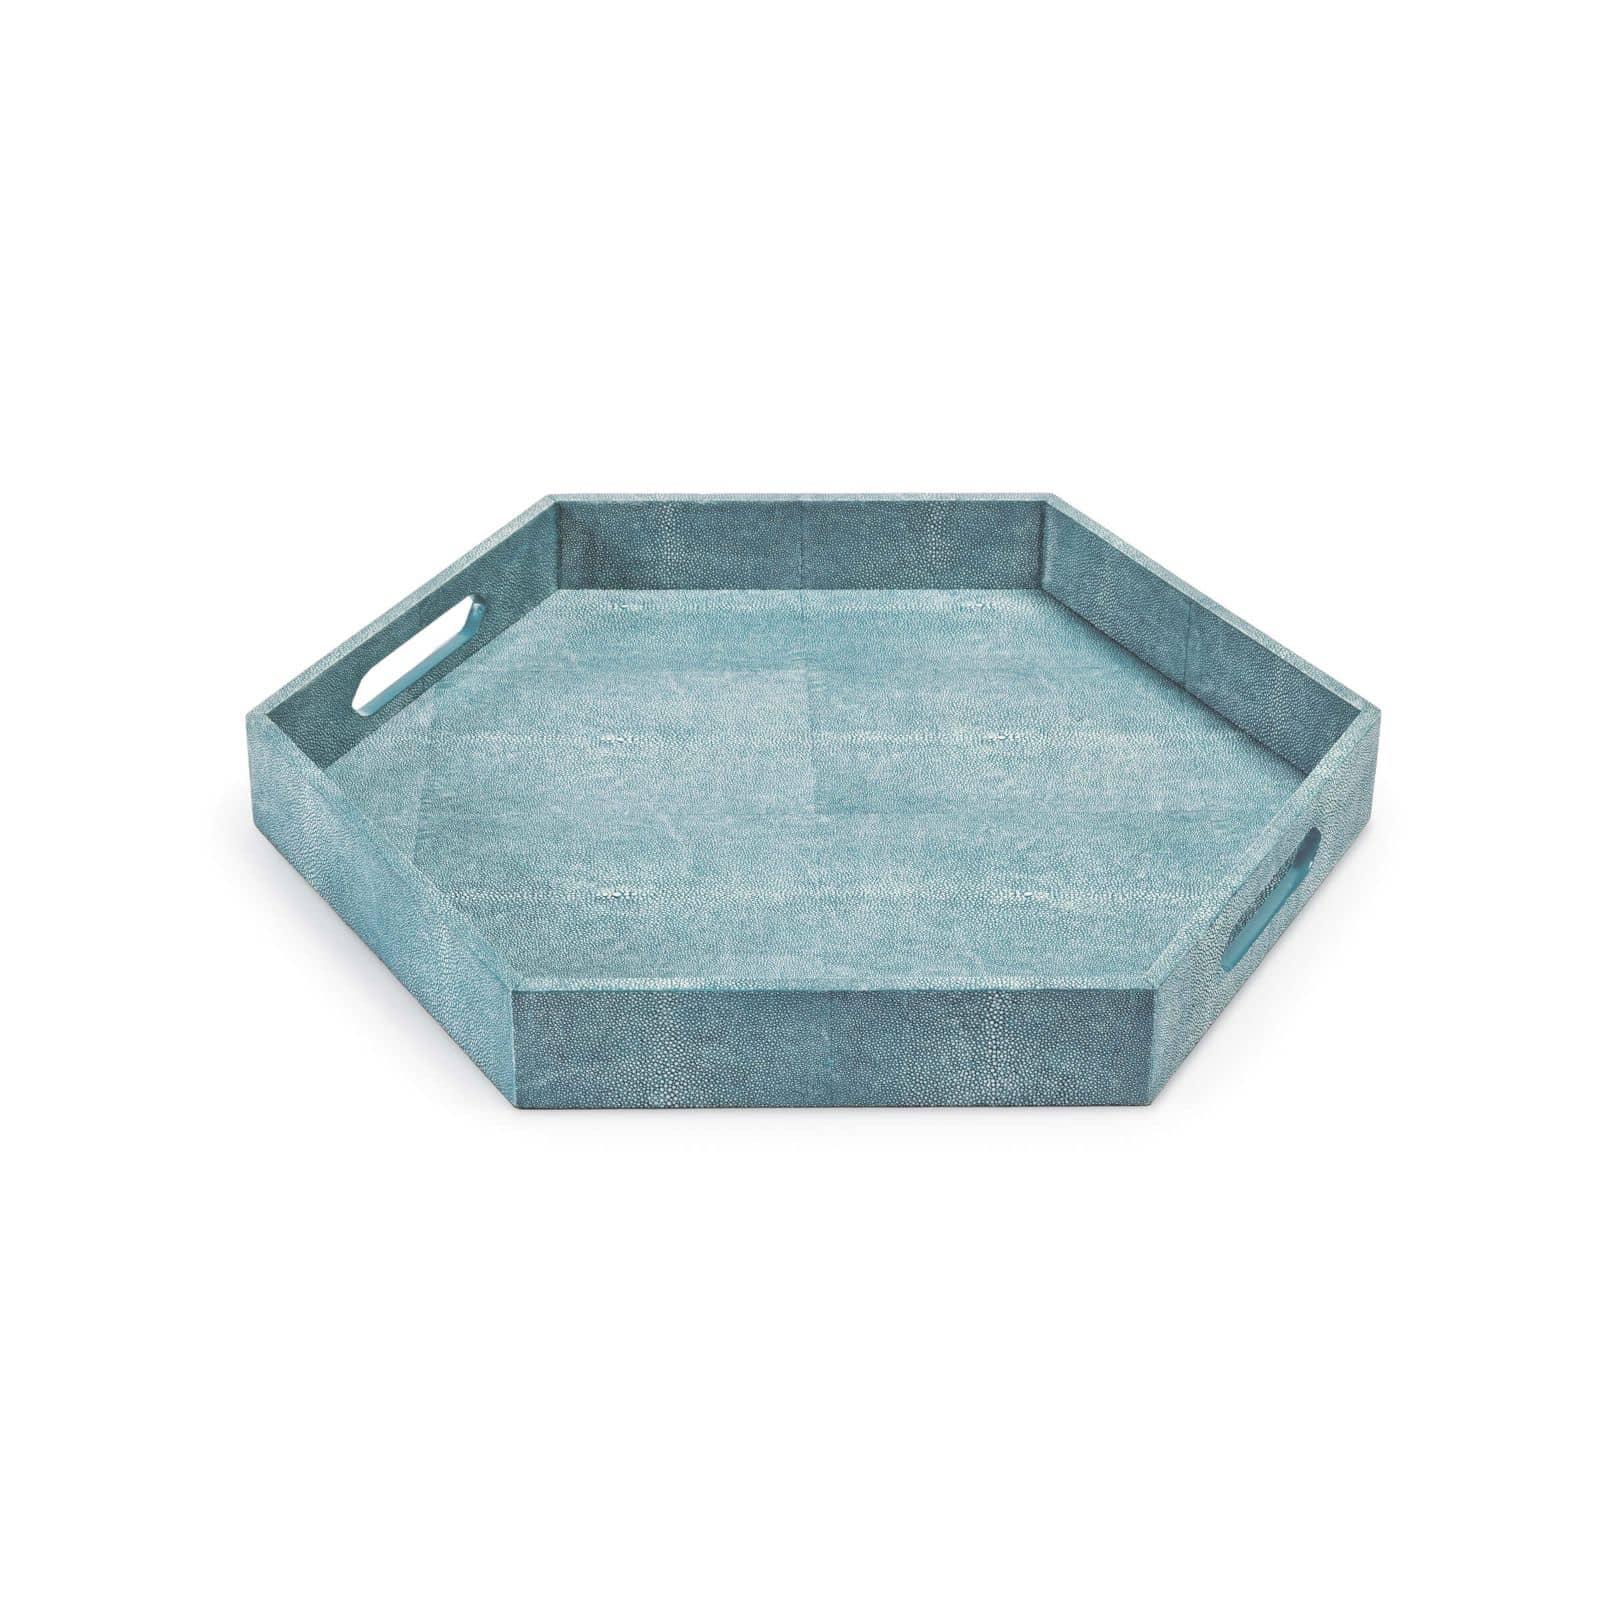 Shagreen Hex Tray Turquoise | Regina Andrew